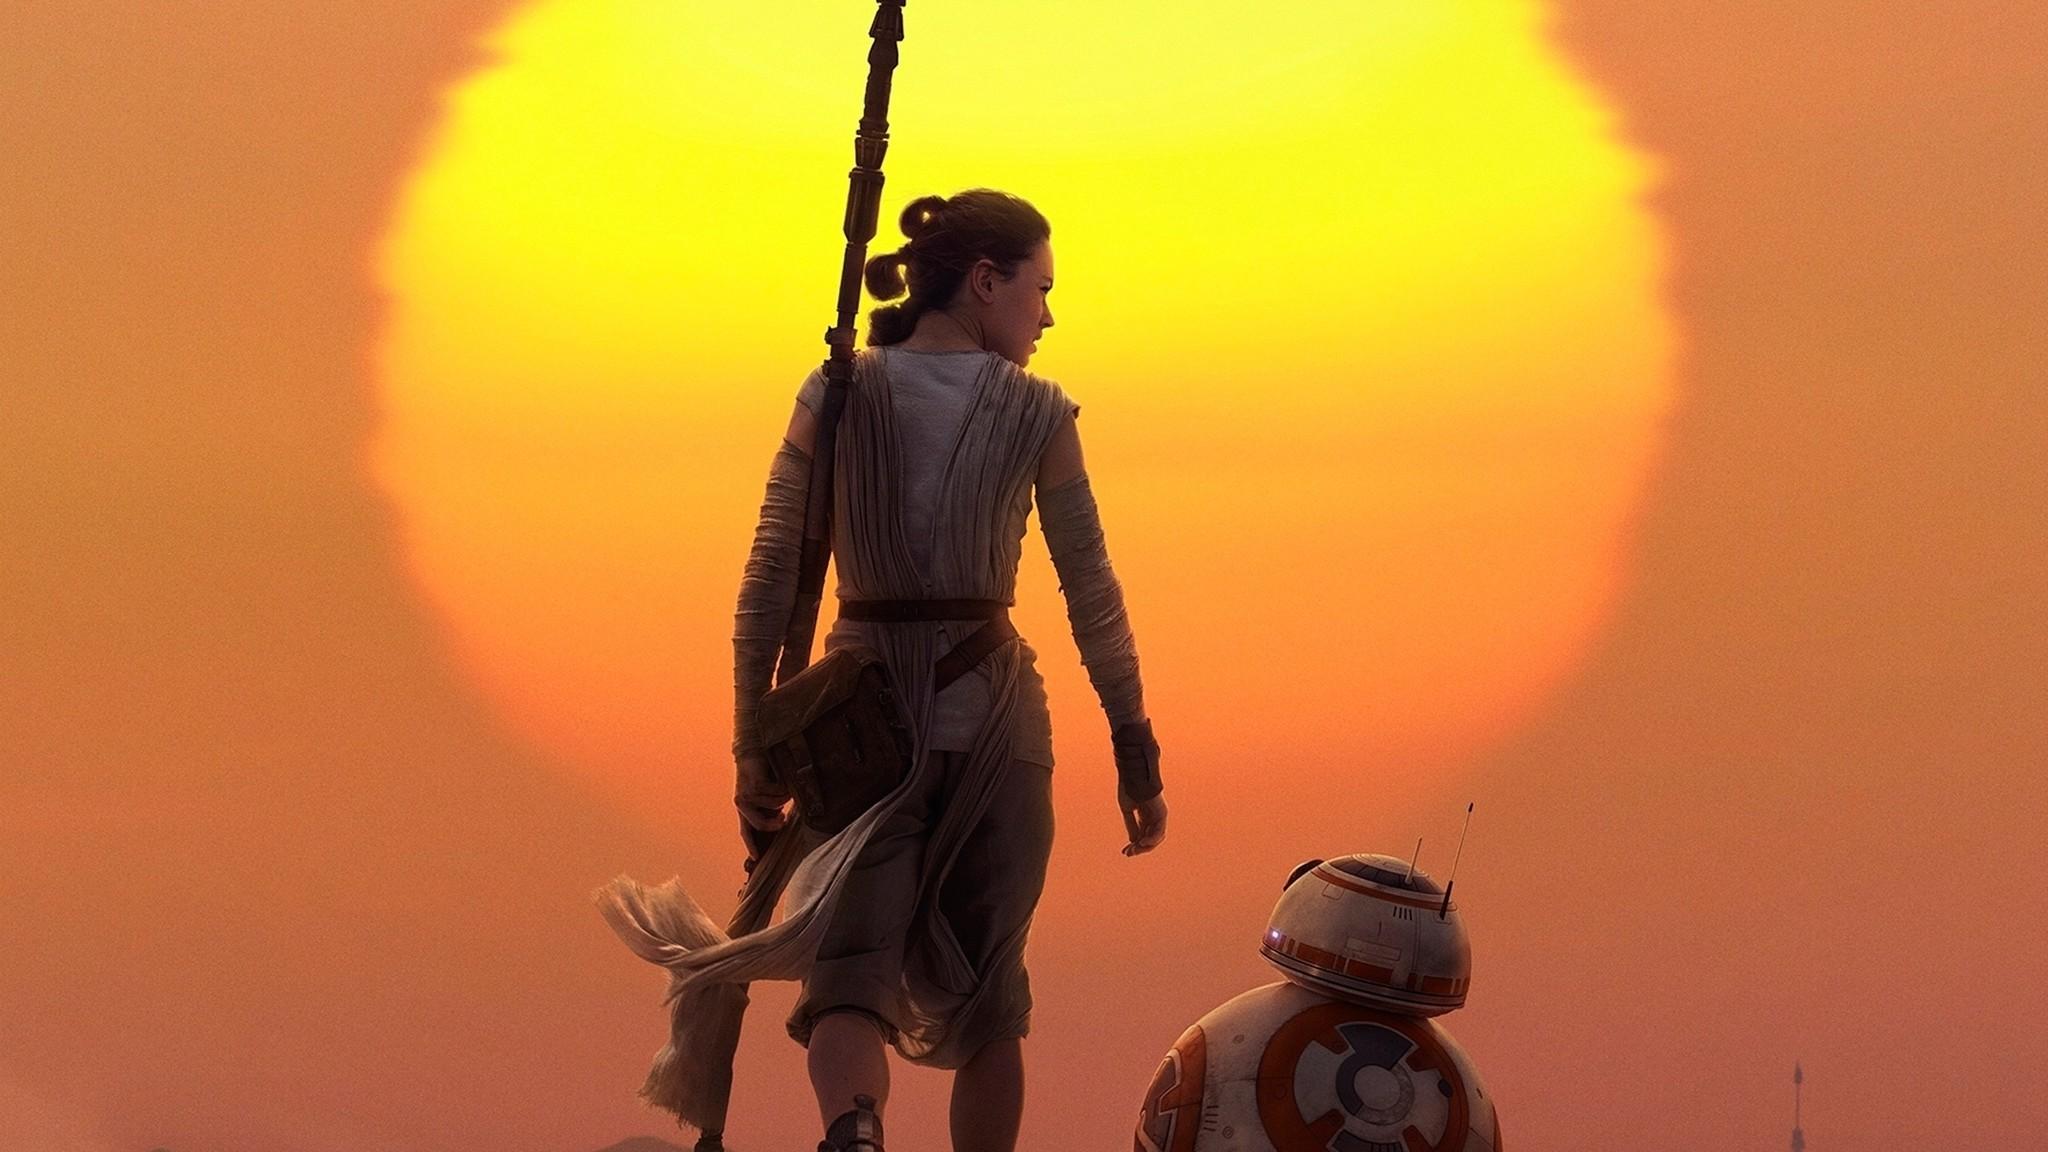 Download Rey BB8 Star Wars HD 4k Wallpapers In .